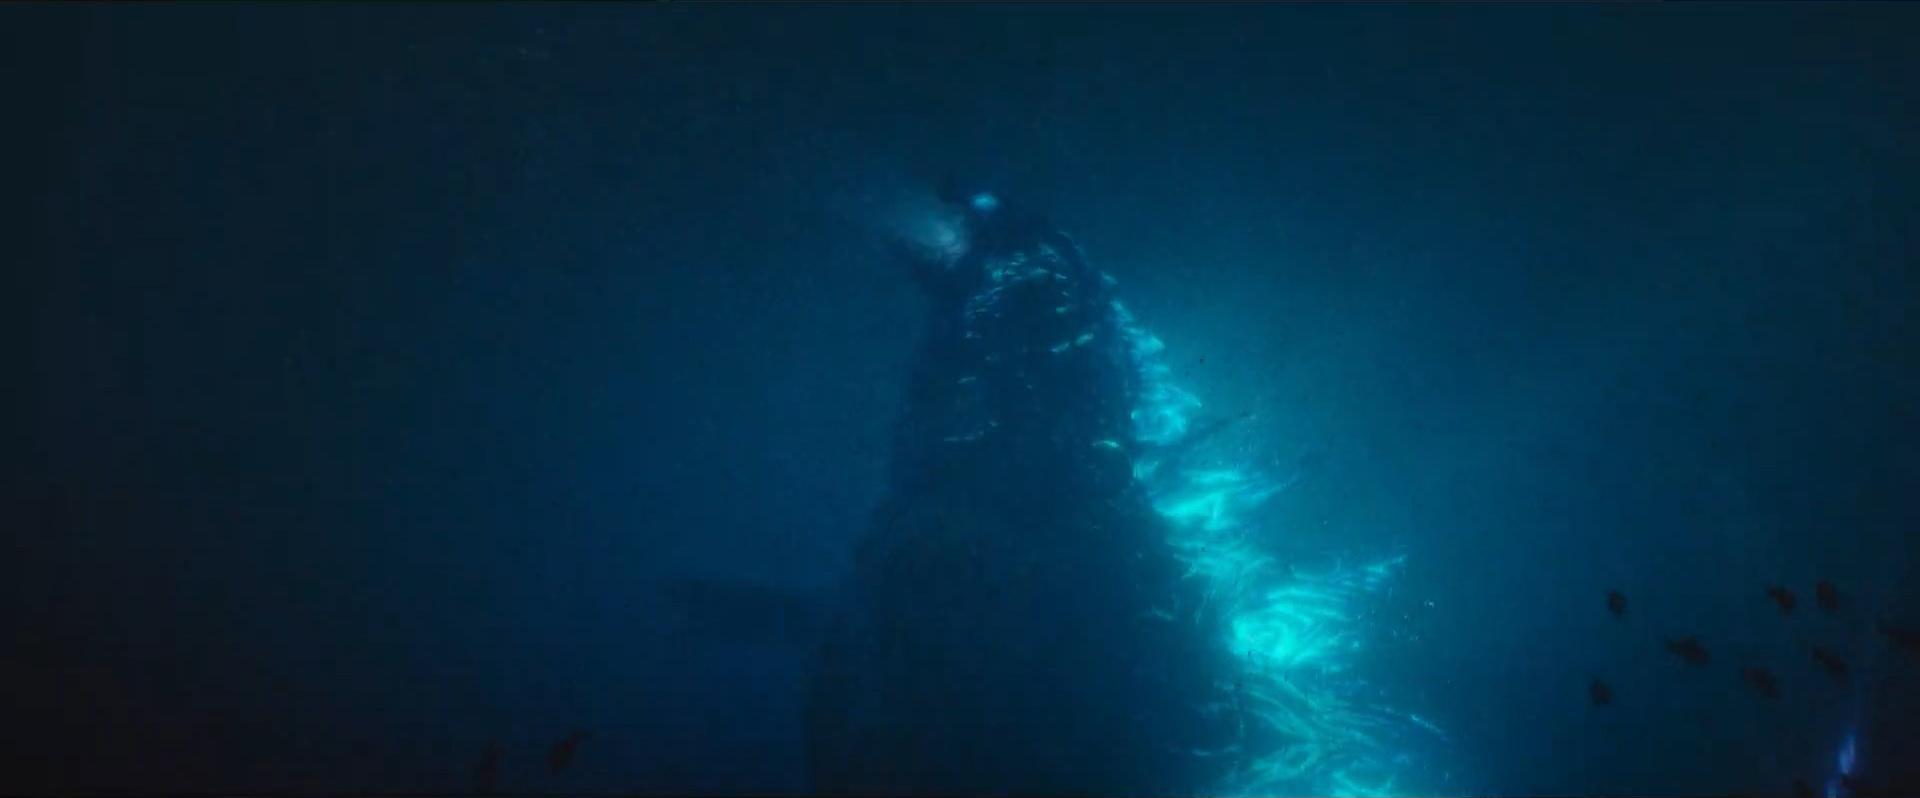 Godzilla vs Kong Trailer Still 45 - Godzilla prepares to fire atomic breath